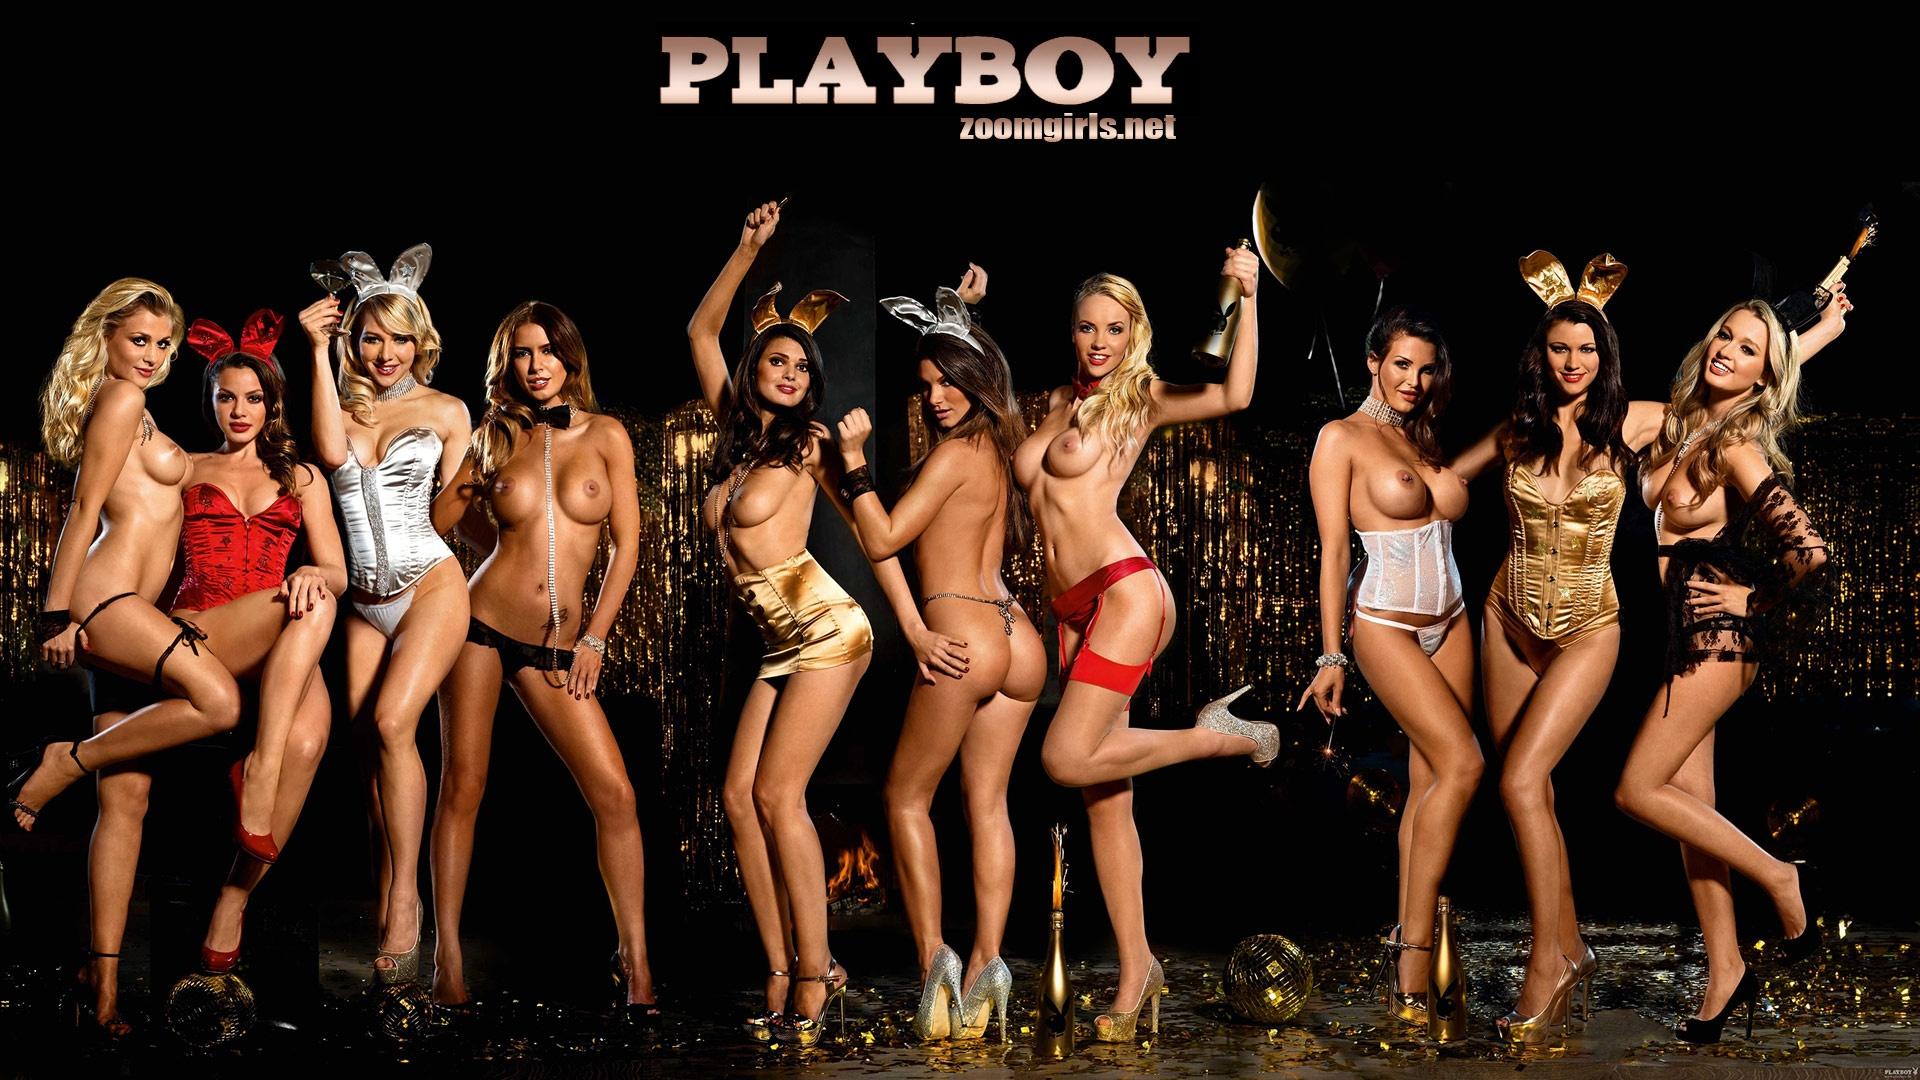 Ashley lauren nude in girls of playboy golf